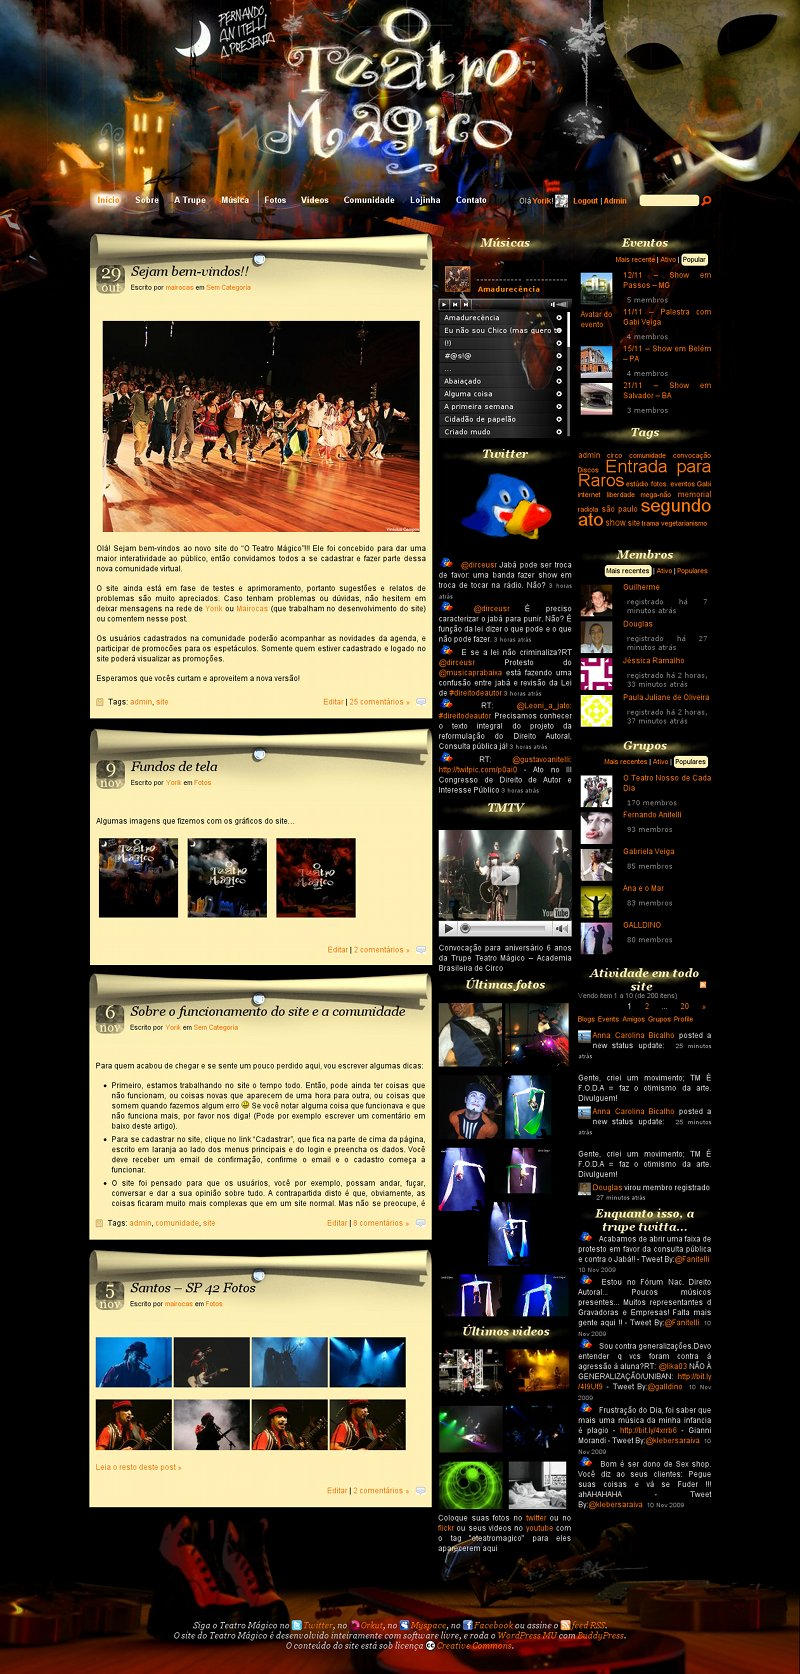 Teatro Magico BuddyPress theme by yorikvanhavre